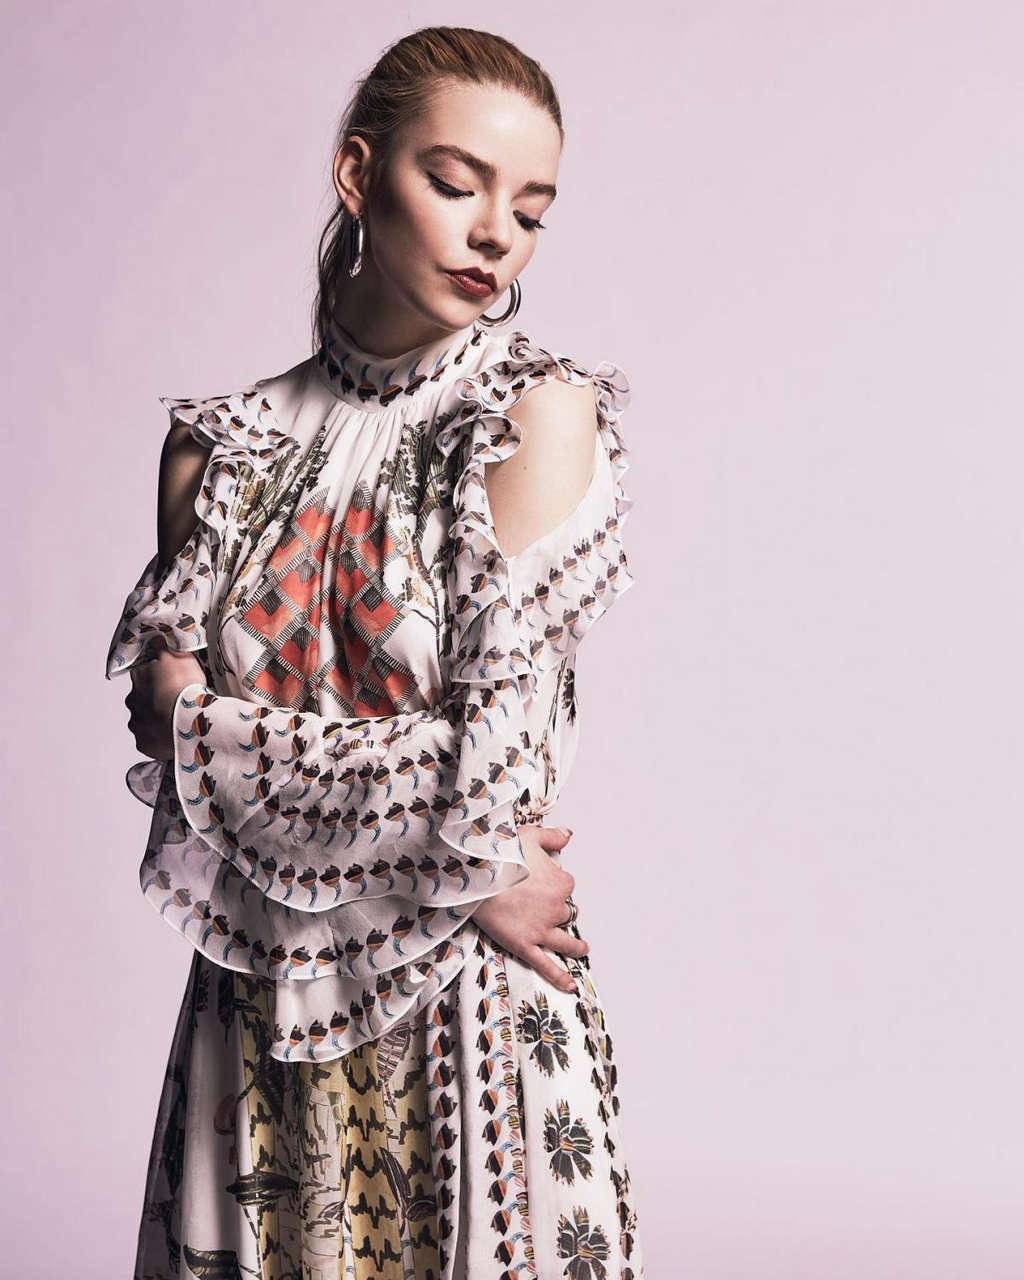 Anya Taylor Joy For La Vanguardia Magazine August